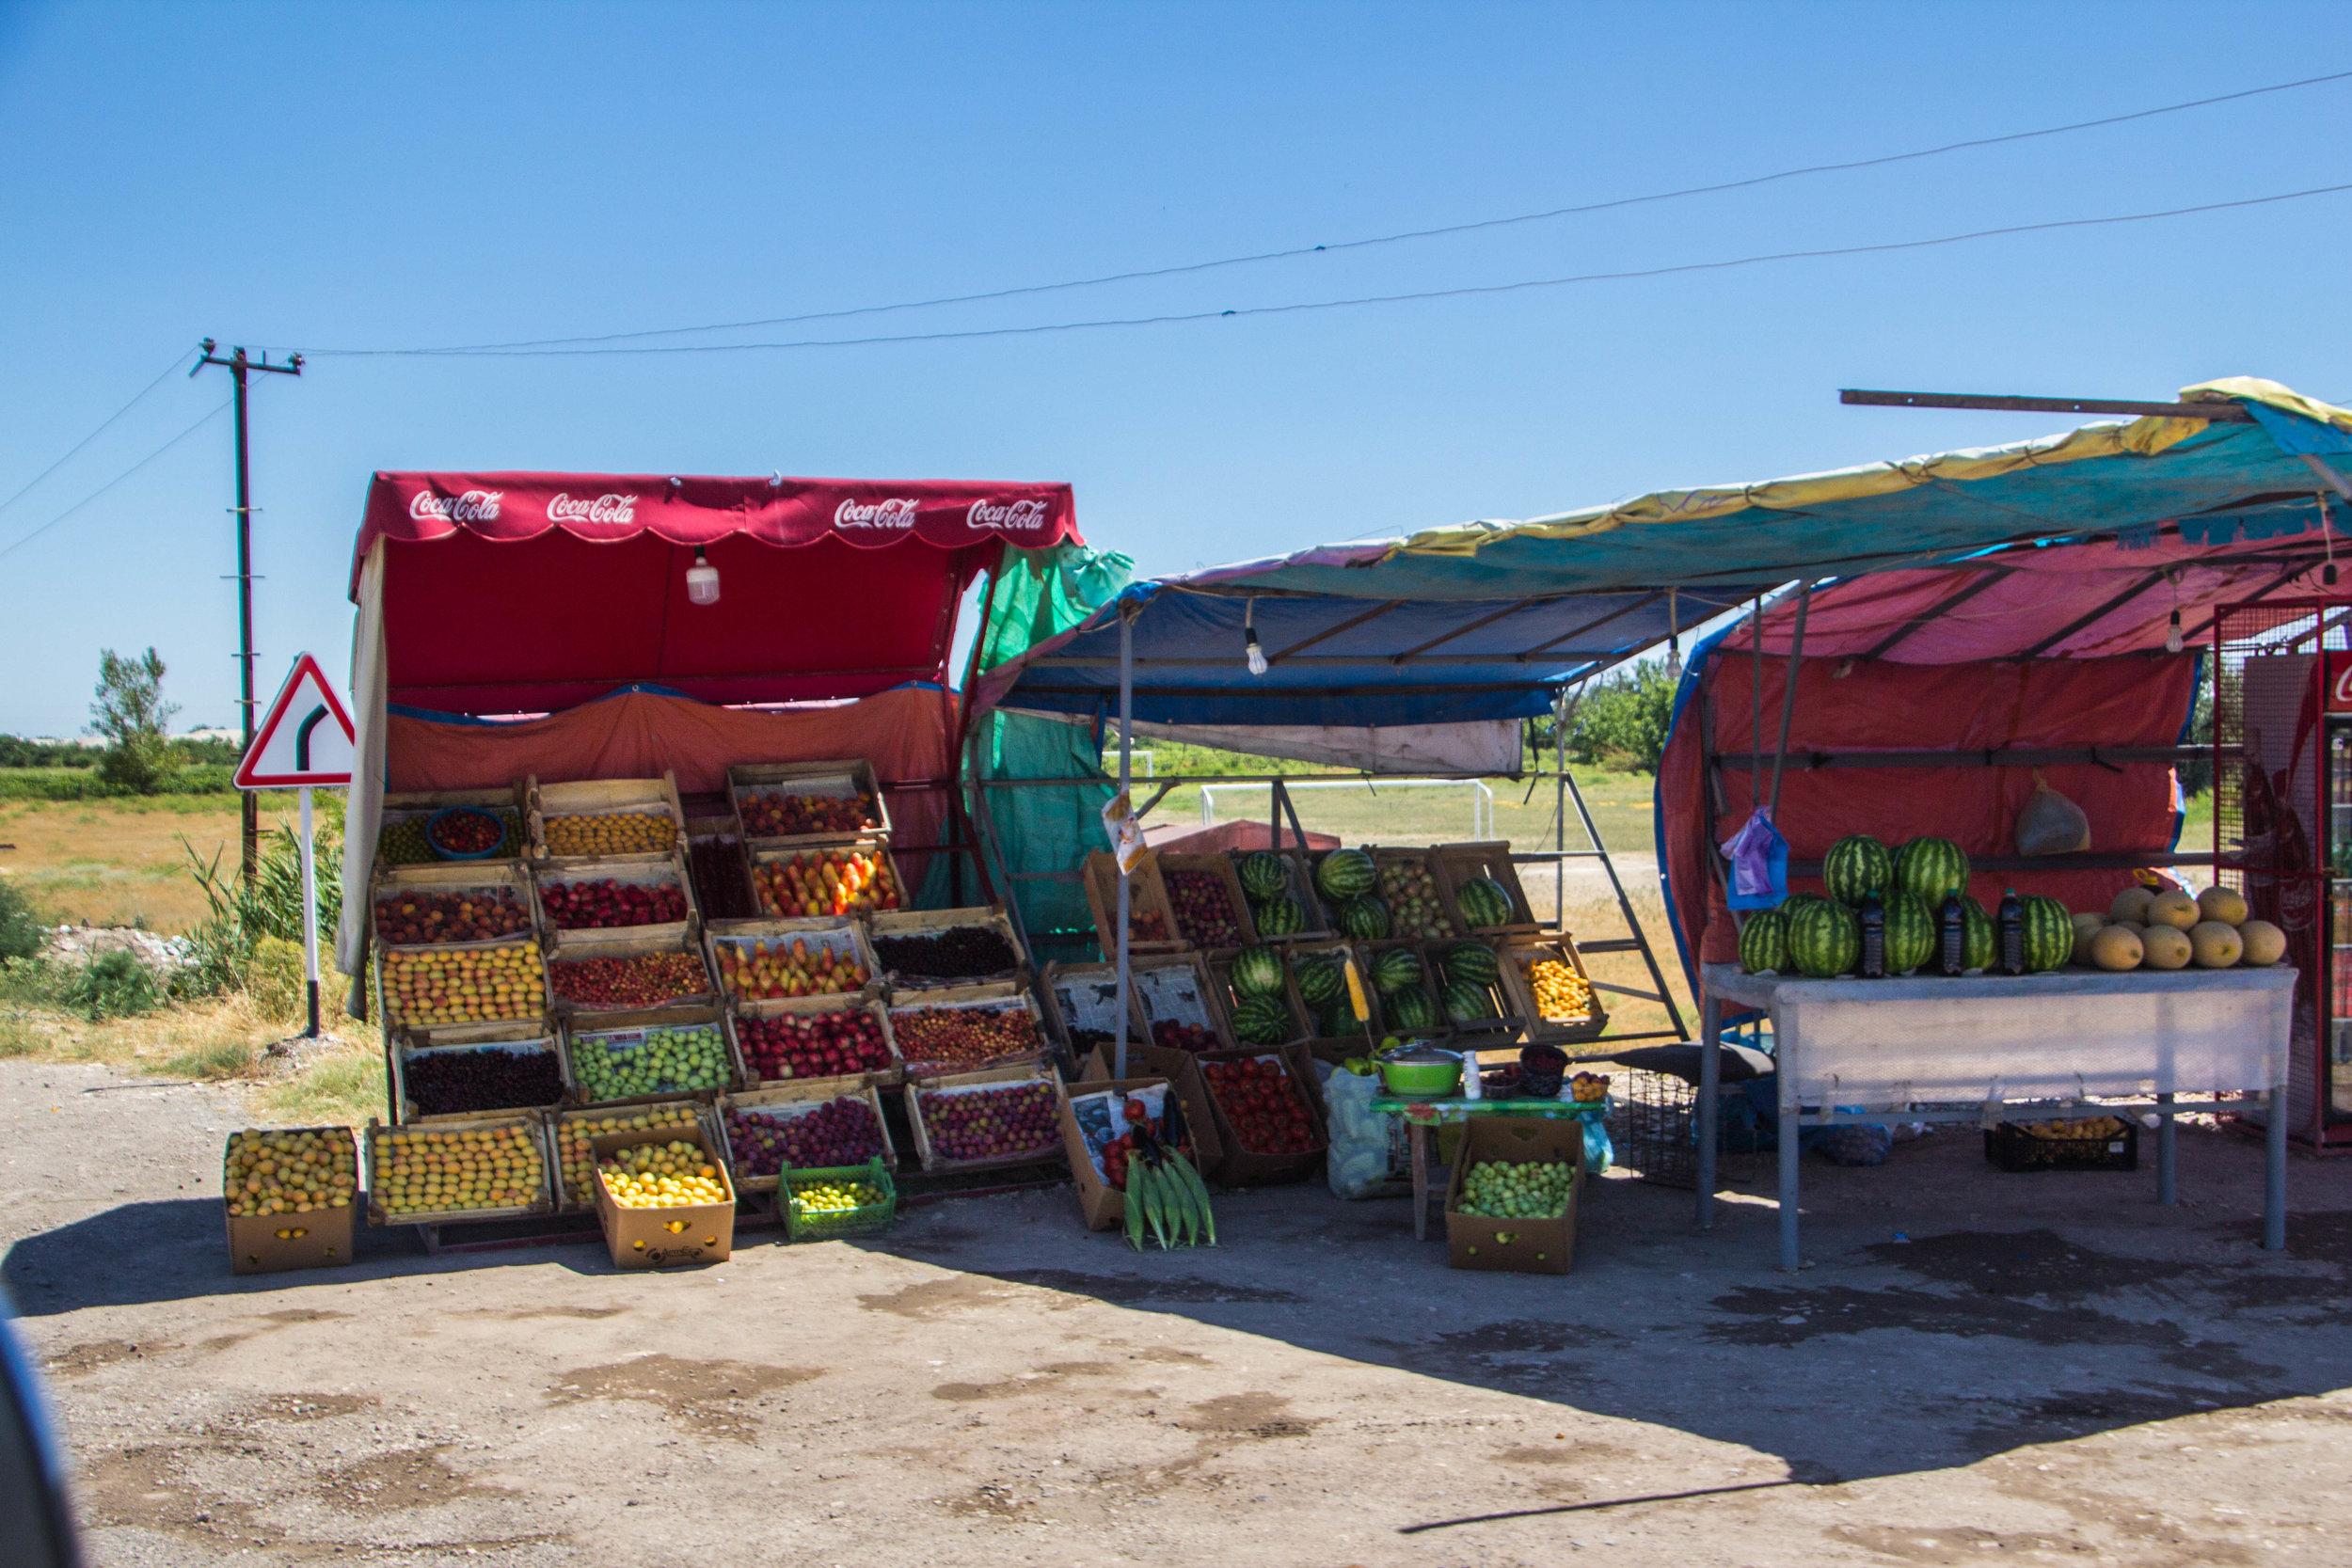 armenia-azerbaijan-southern-border-3.jpg